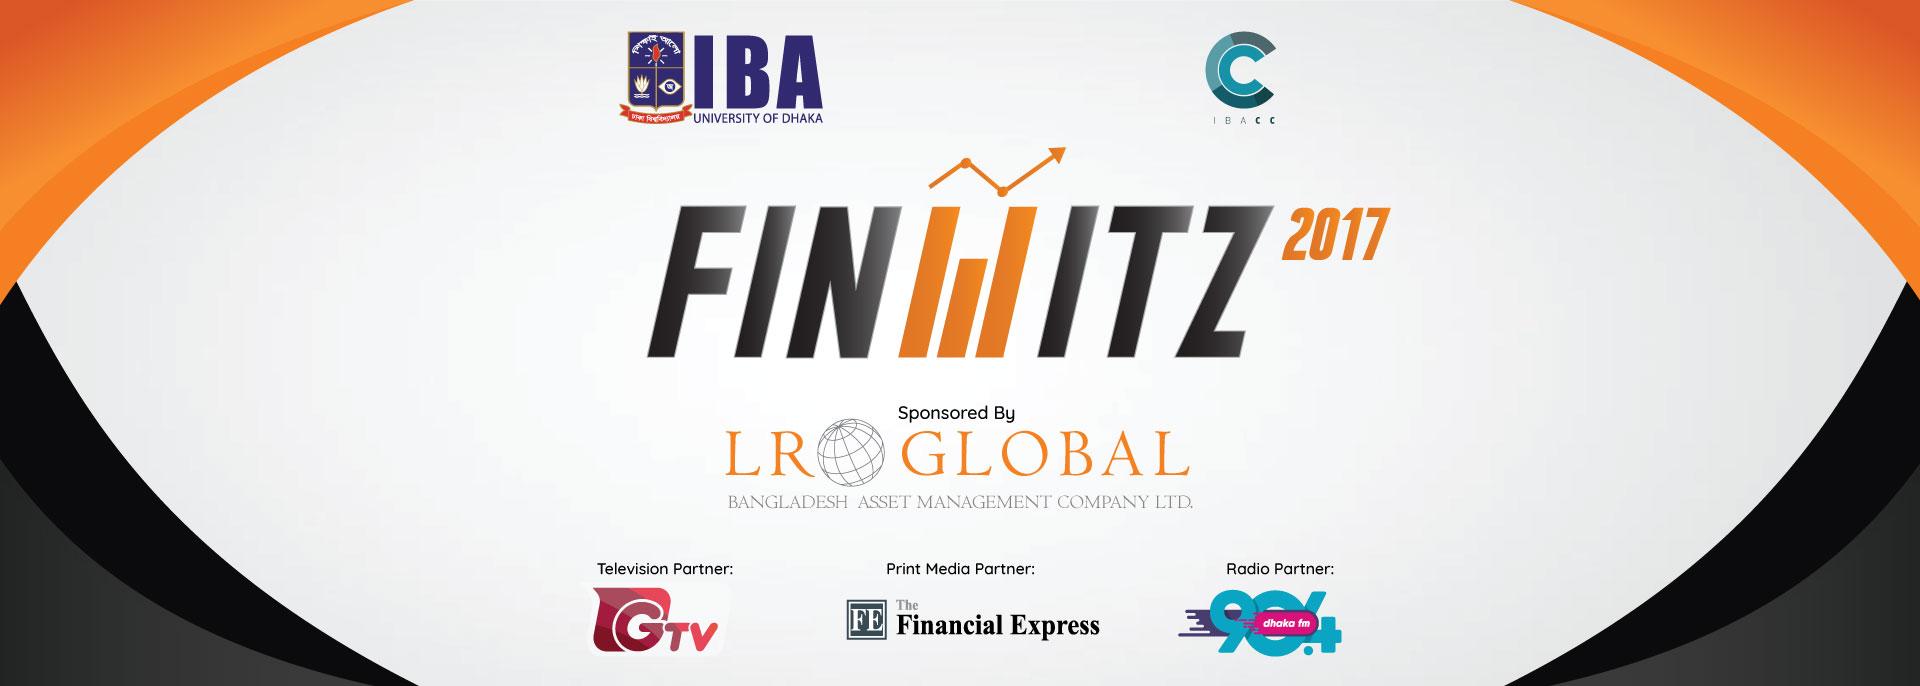 finwitz 2017 round one